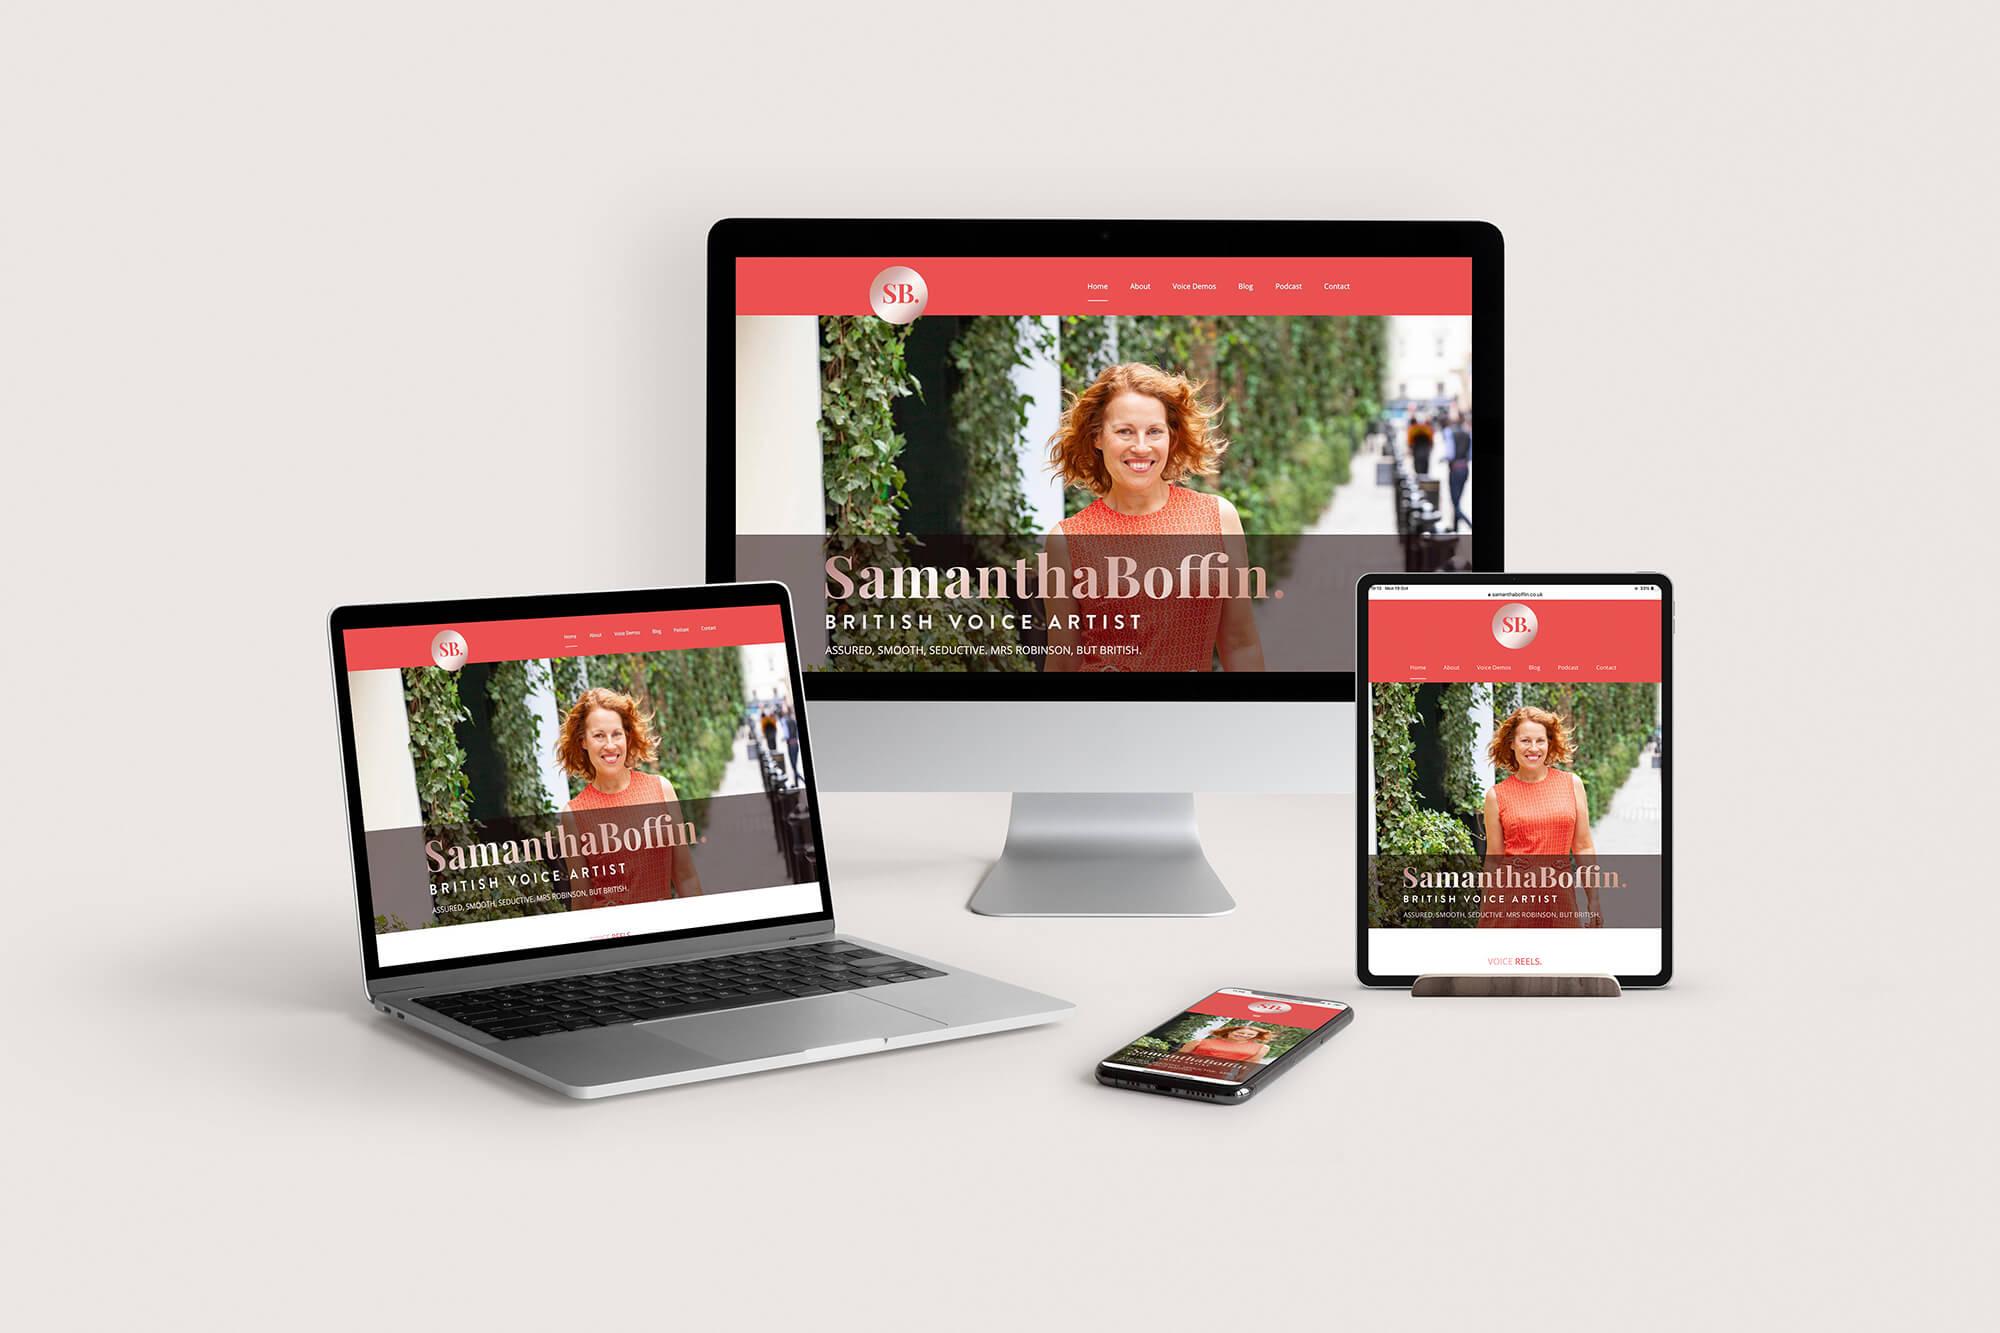 Samantha Boffin voiceover website on ipad, mobile, laptop and desktop